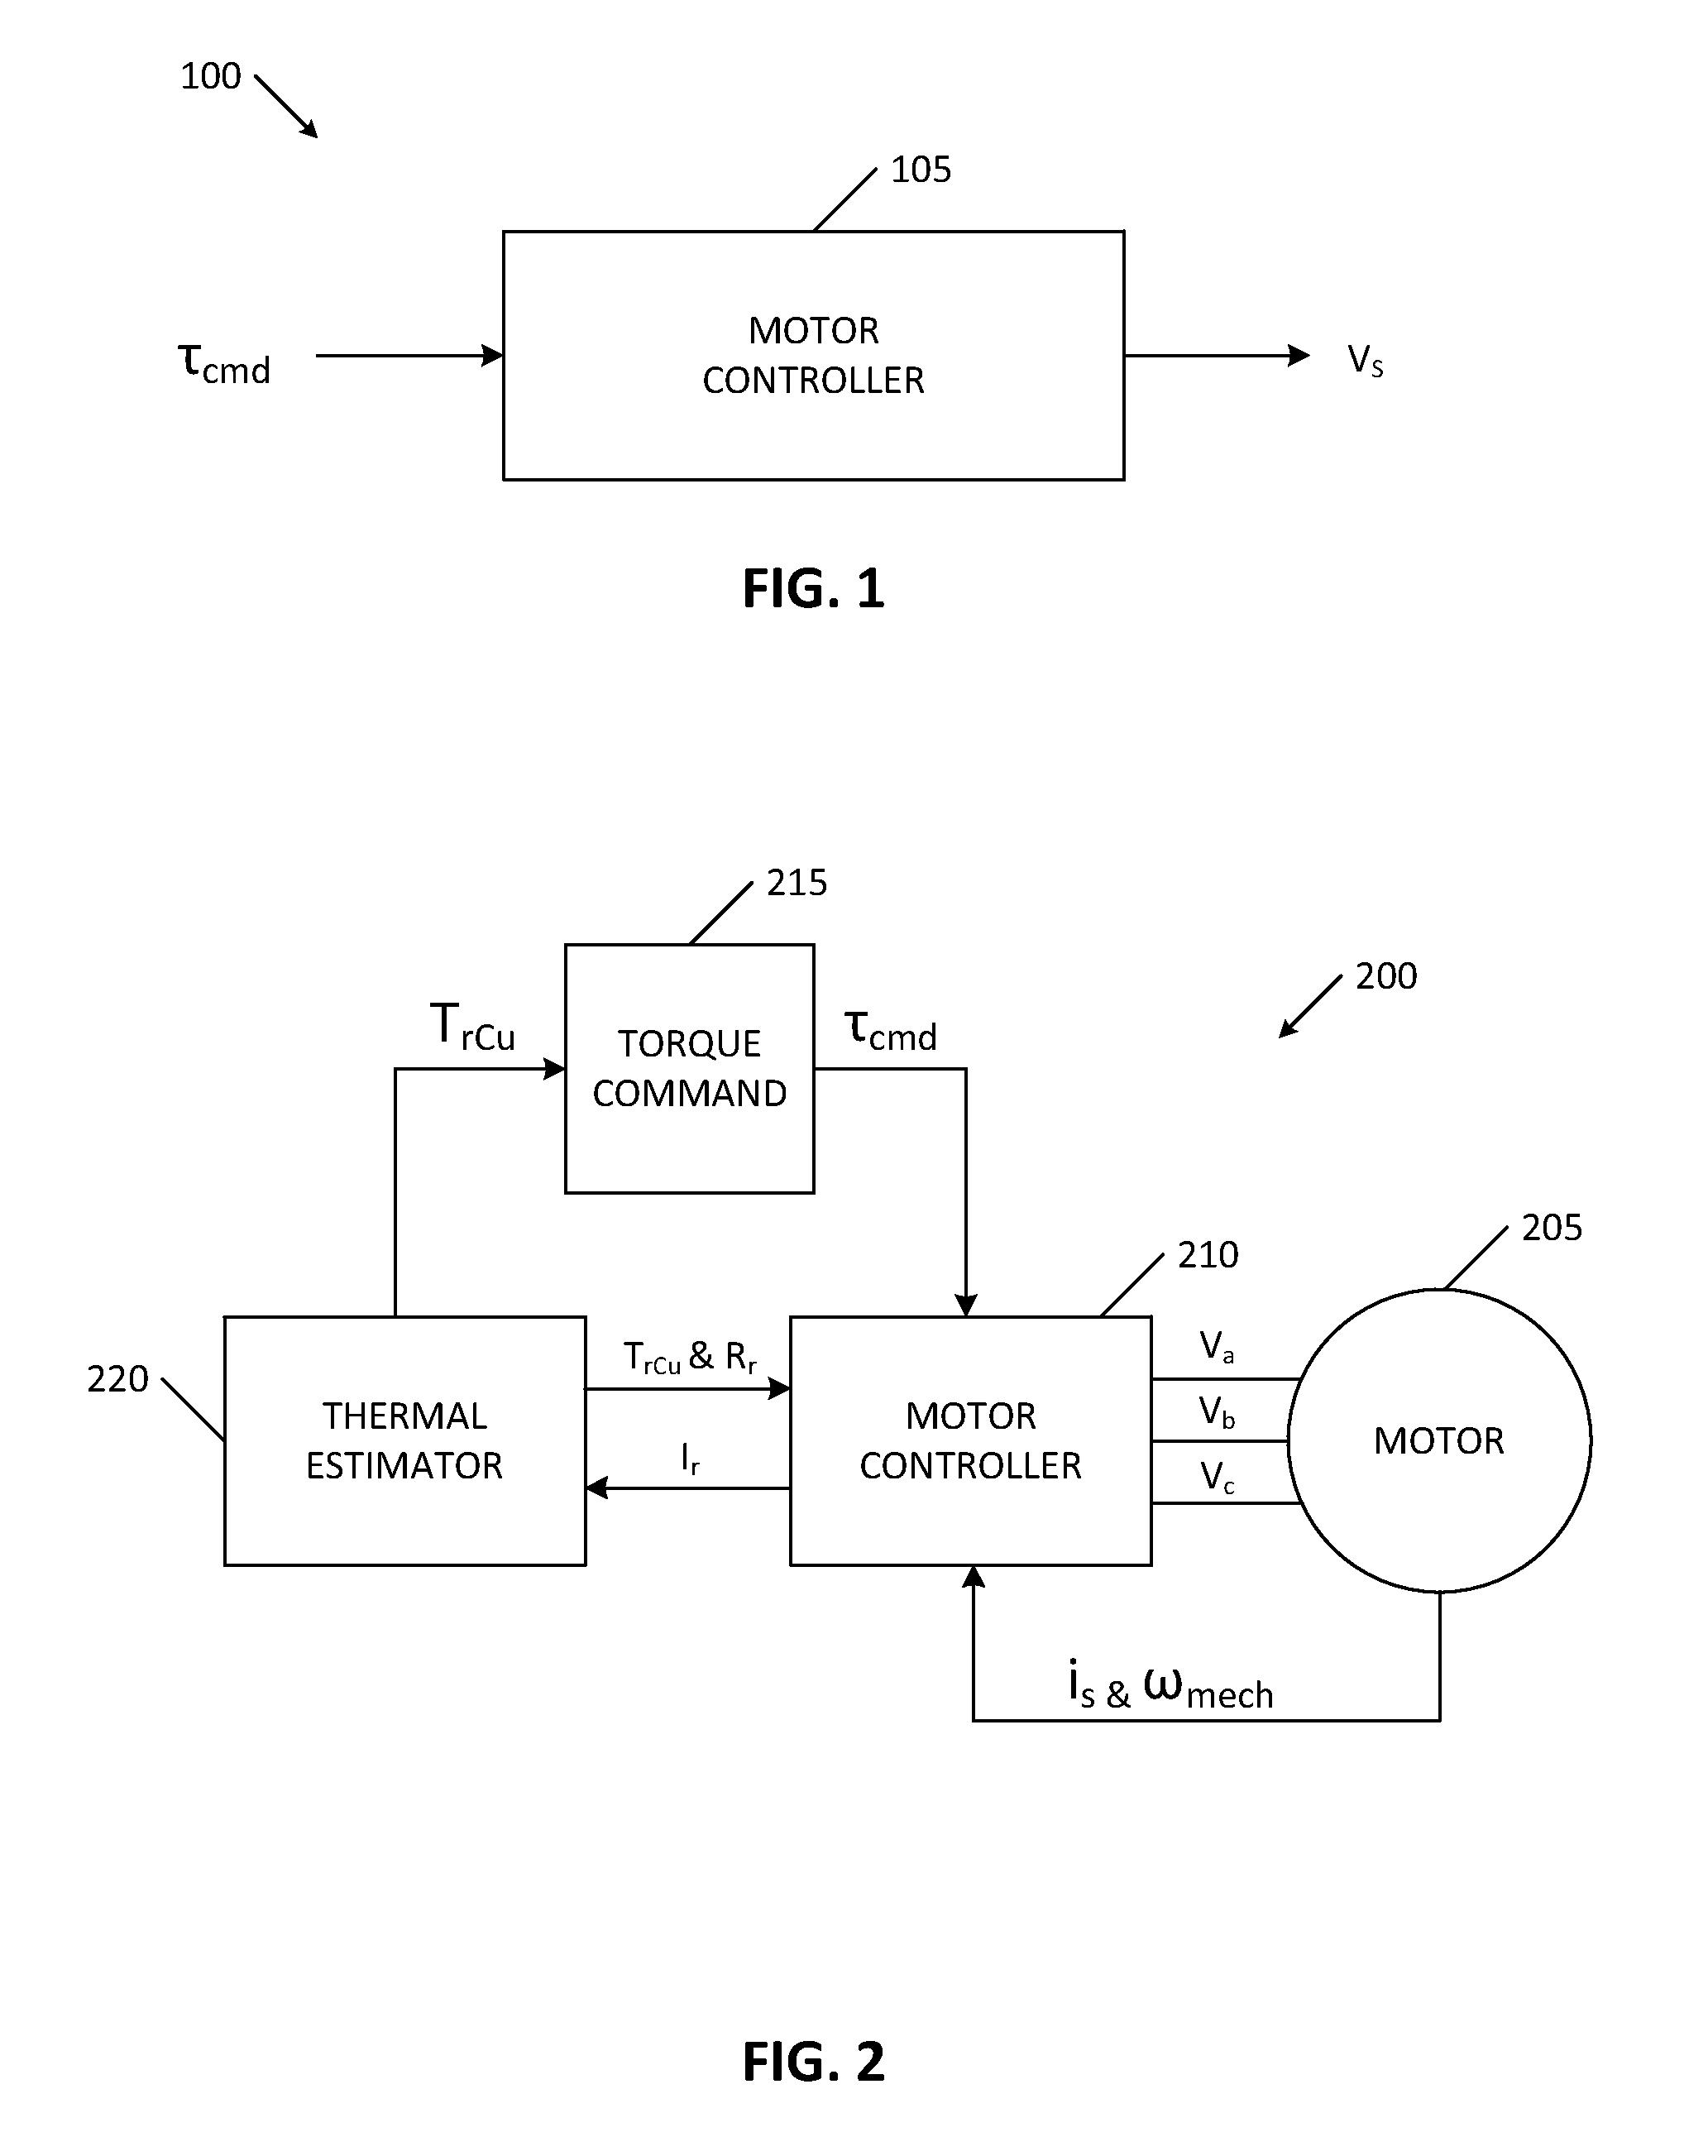 Scs  Frigette Electric Step Wiring Diagram